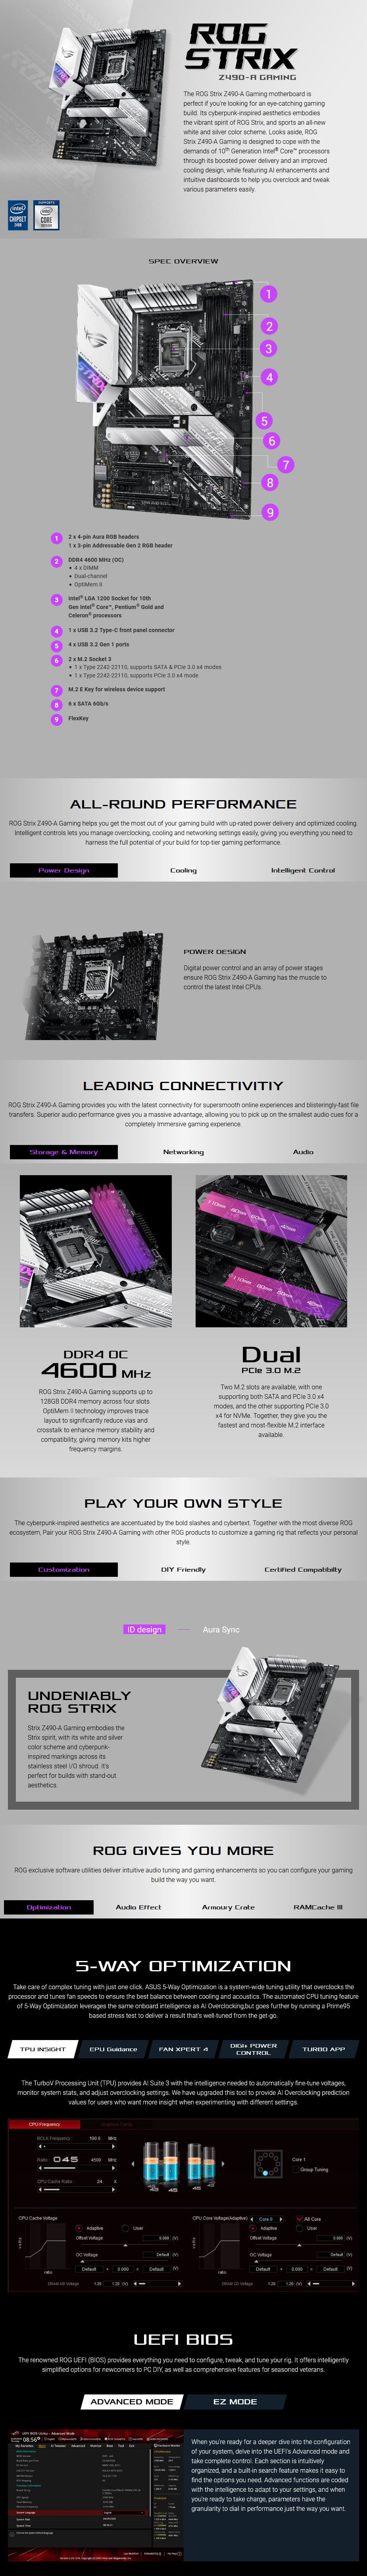 asus-rog-strix-z490a-gaming-lga-1200-motherboard-ac34478-9.jpg